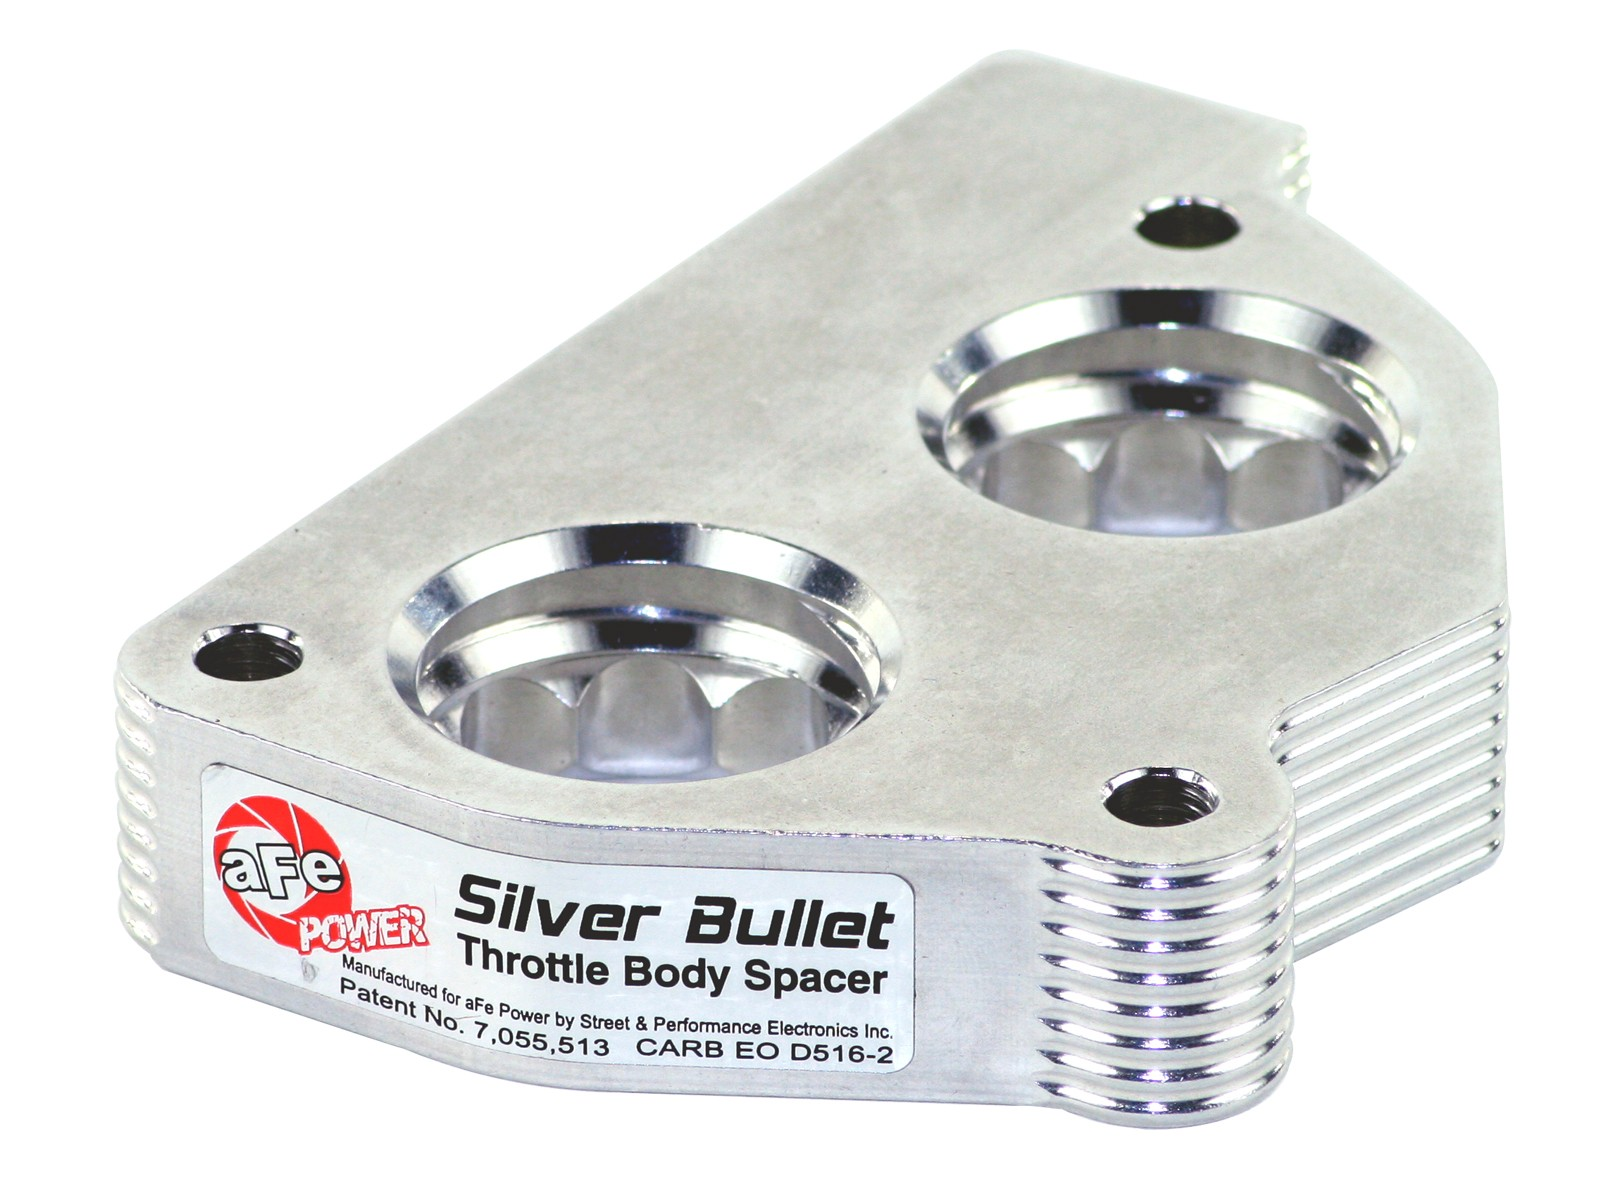 aFe POWER 46-34004 Silver Bullet Throttle Body Spacer